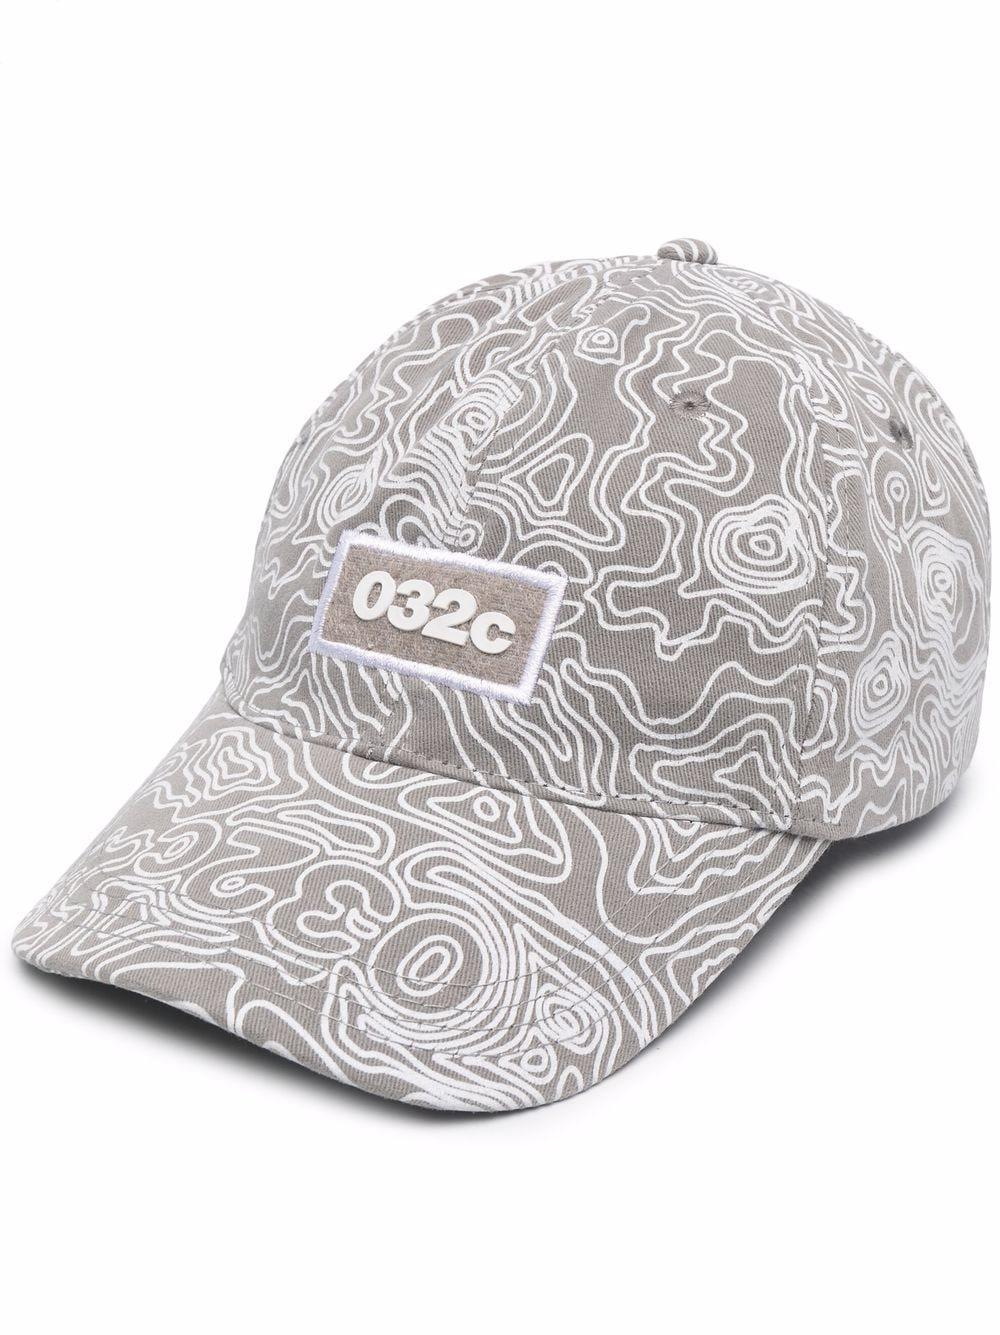 Cappello con logo grigio uomo cotone 032c   Cappelli   SS21-A-0030GREY PURPLE